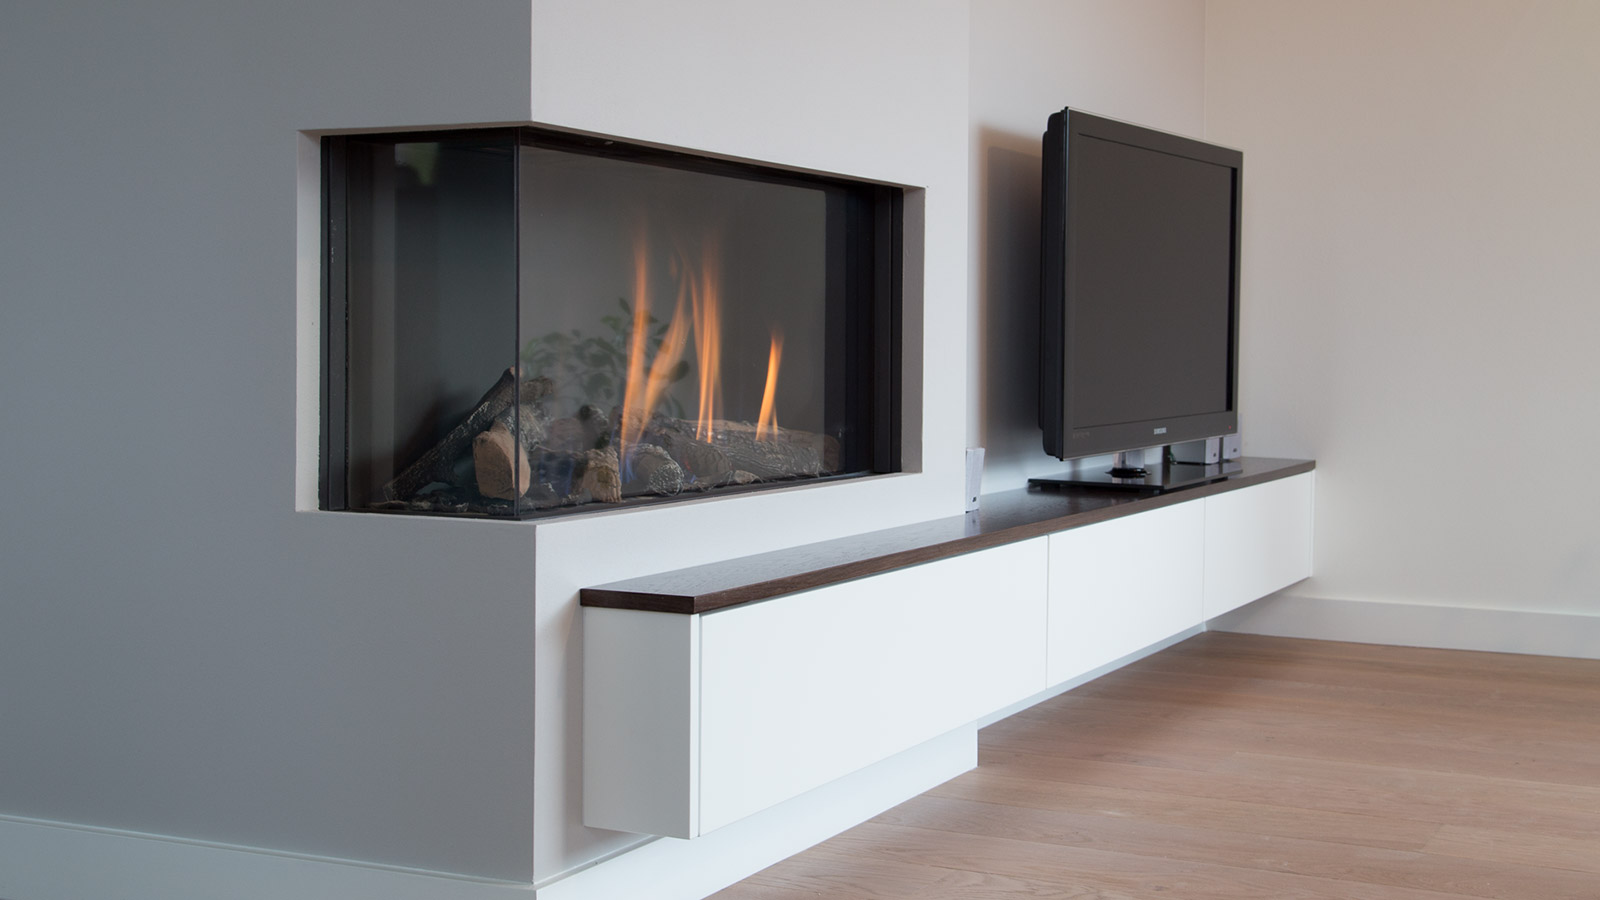 Design Woonkamer Kast : TV-meubel in muur verdiept - CVH Design ...